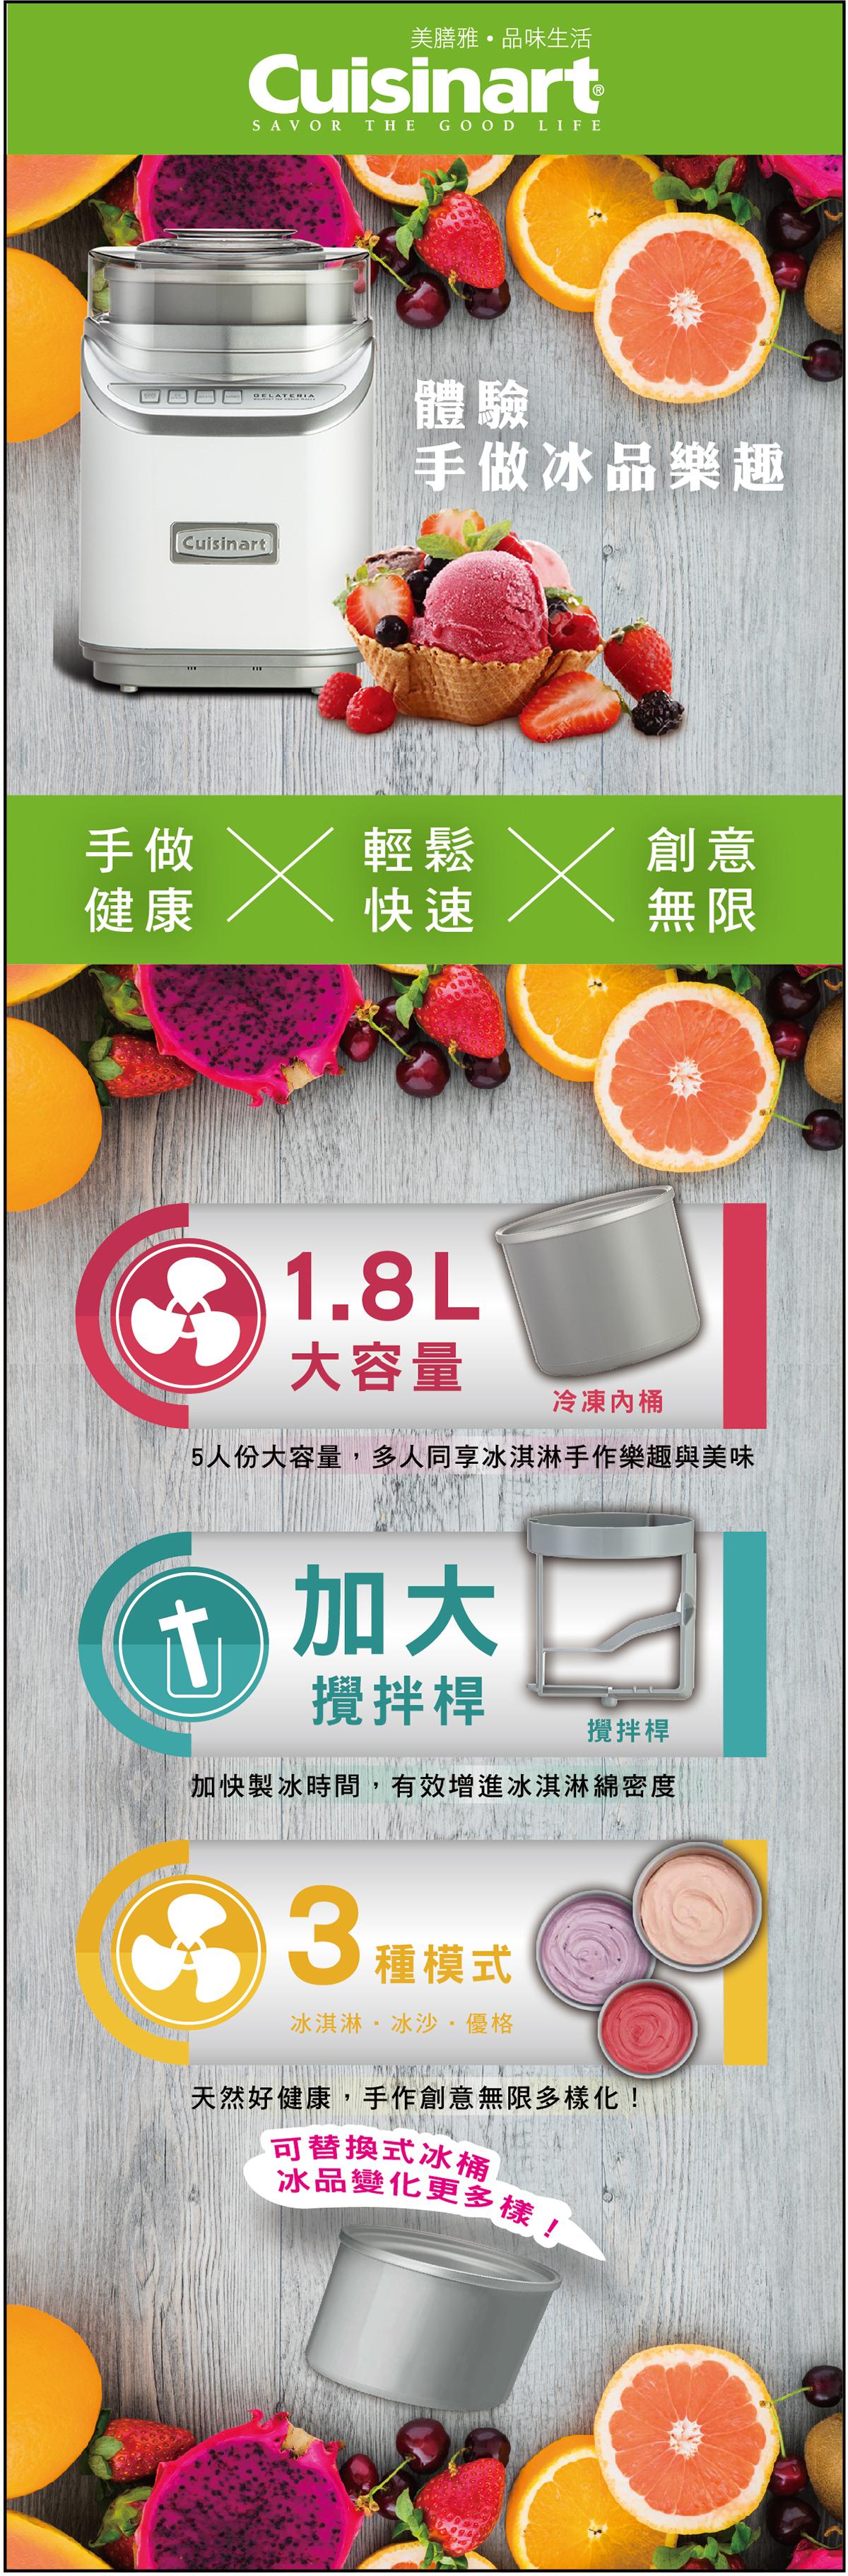 Cuisinart 半自動冰淇淋機讓您體驗手做冰淇淋,冰沙,優格.不僅創意,健康,快速又輕鬆。1.8L大容量享受多人製冰樂趣;加大攪拌桿加快製冰速度,綿密度;3種模式製作冰淇淋,冰沙,優格;可替換冰桶讓冰品多樣化。